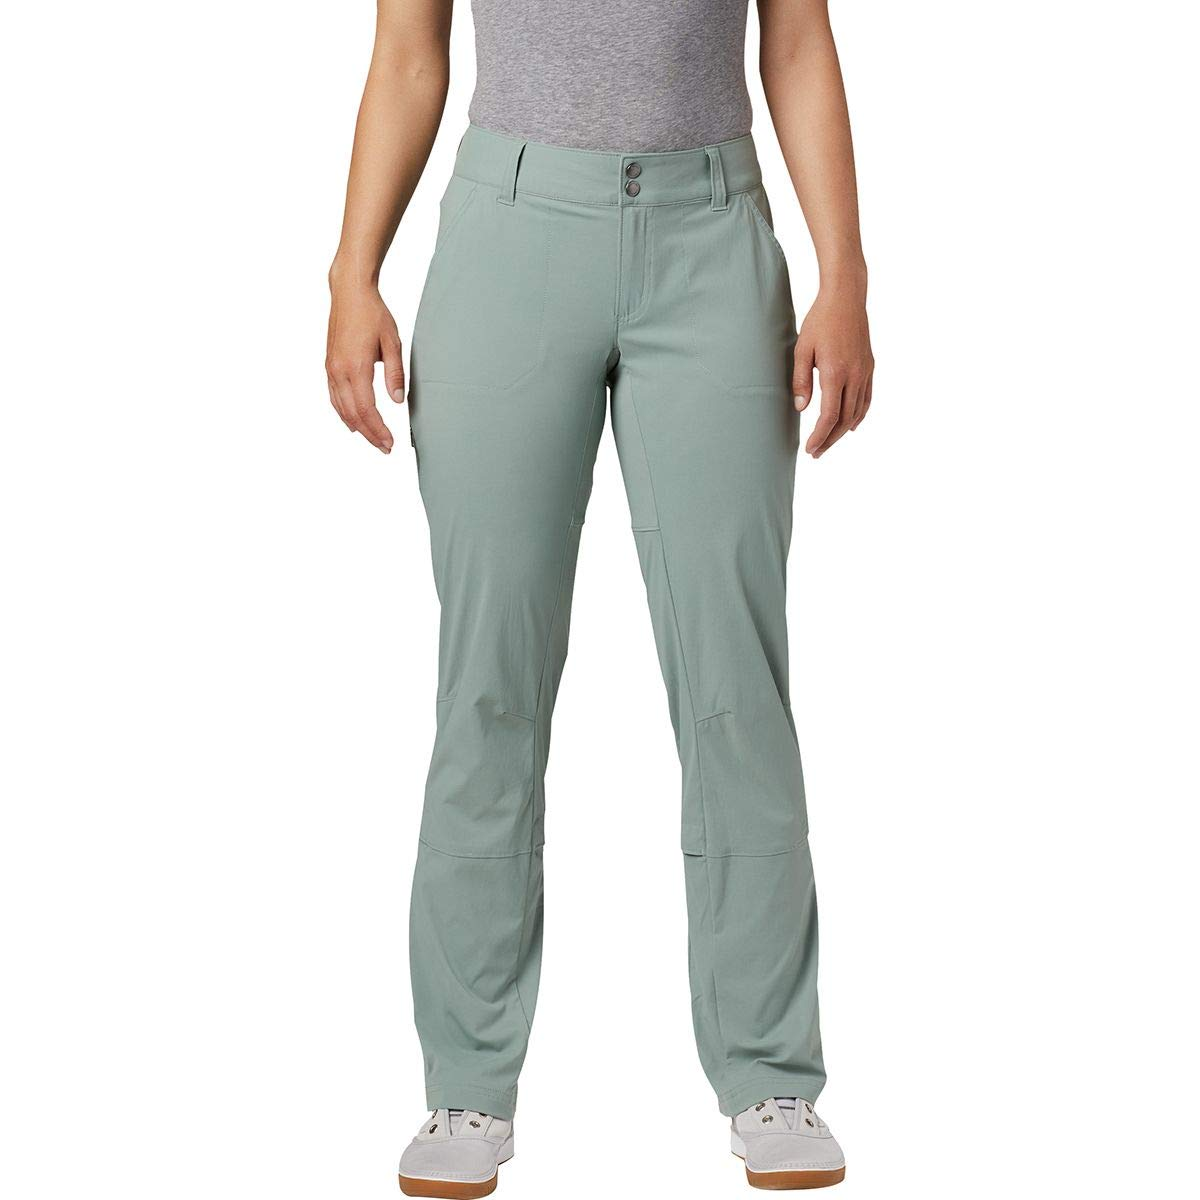 Columbia Women's Standard Saturday Trail Pant, Light Lichen, 12 x Short by Columbia